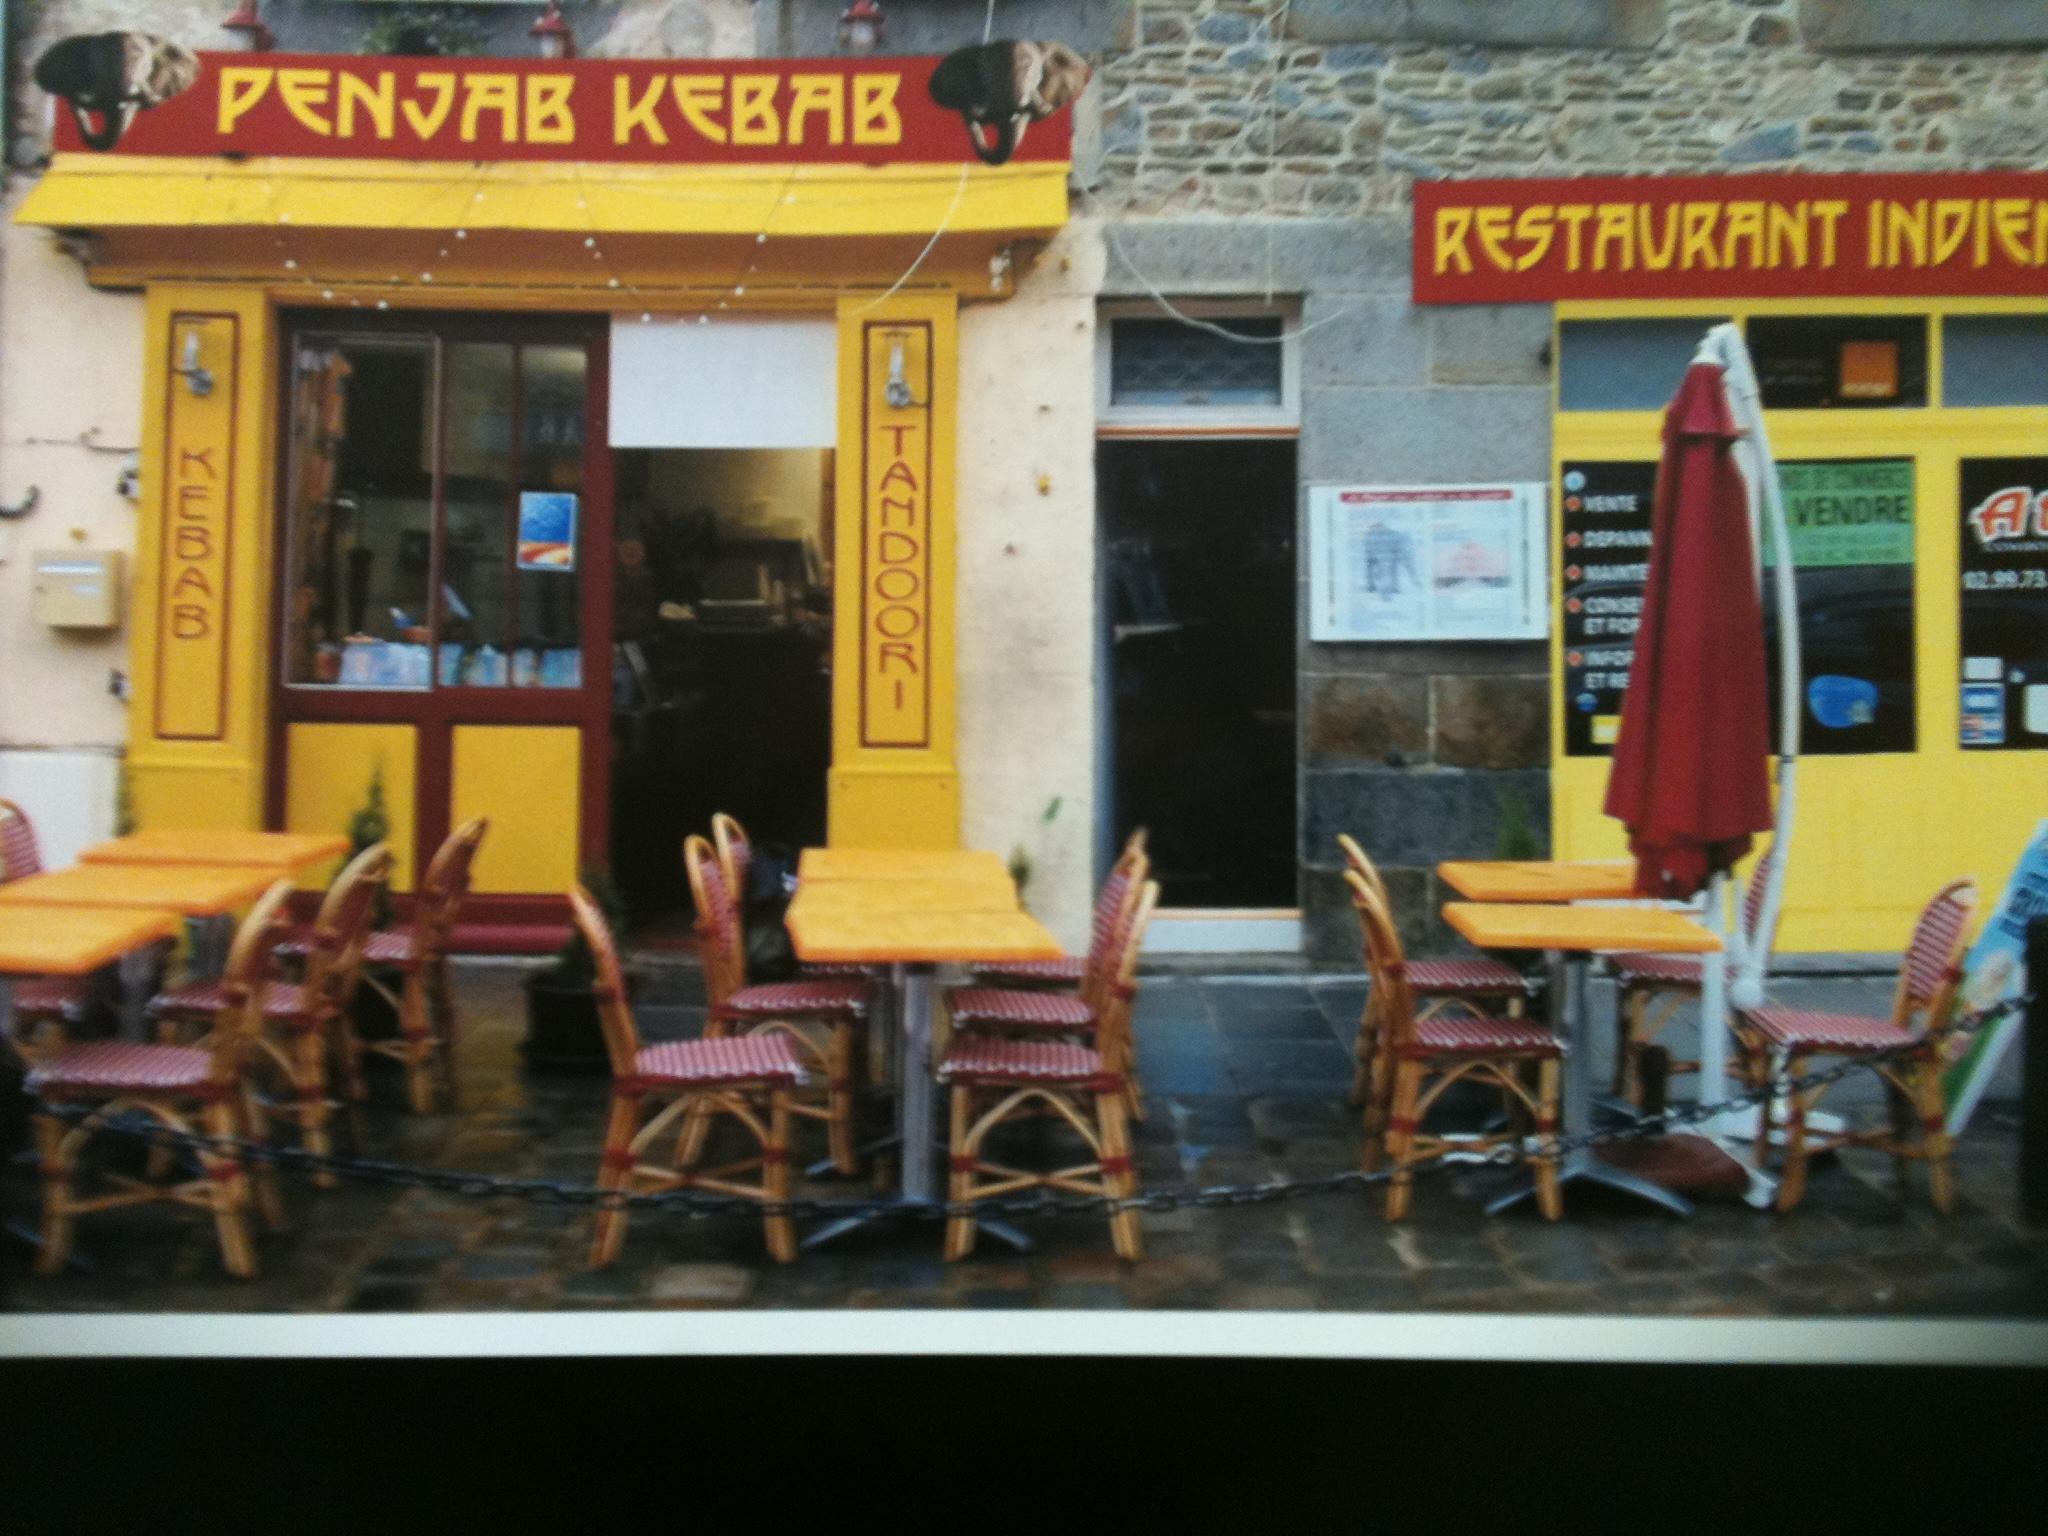 Penjab Kebab à Combourg